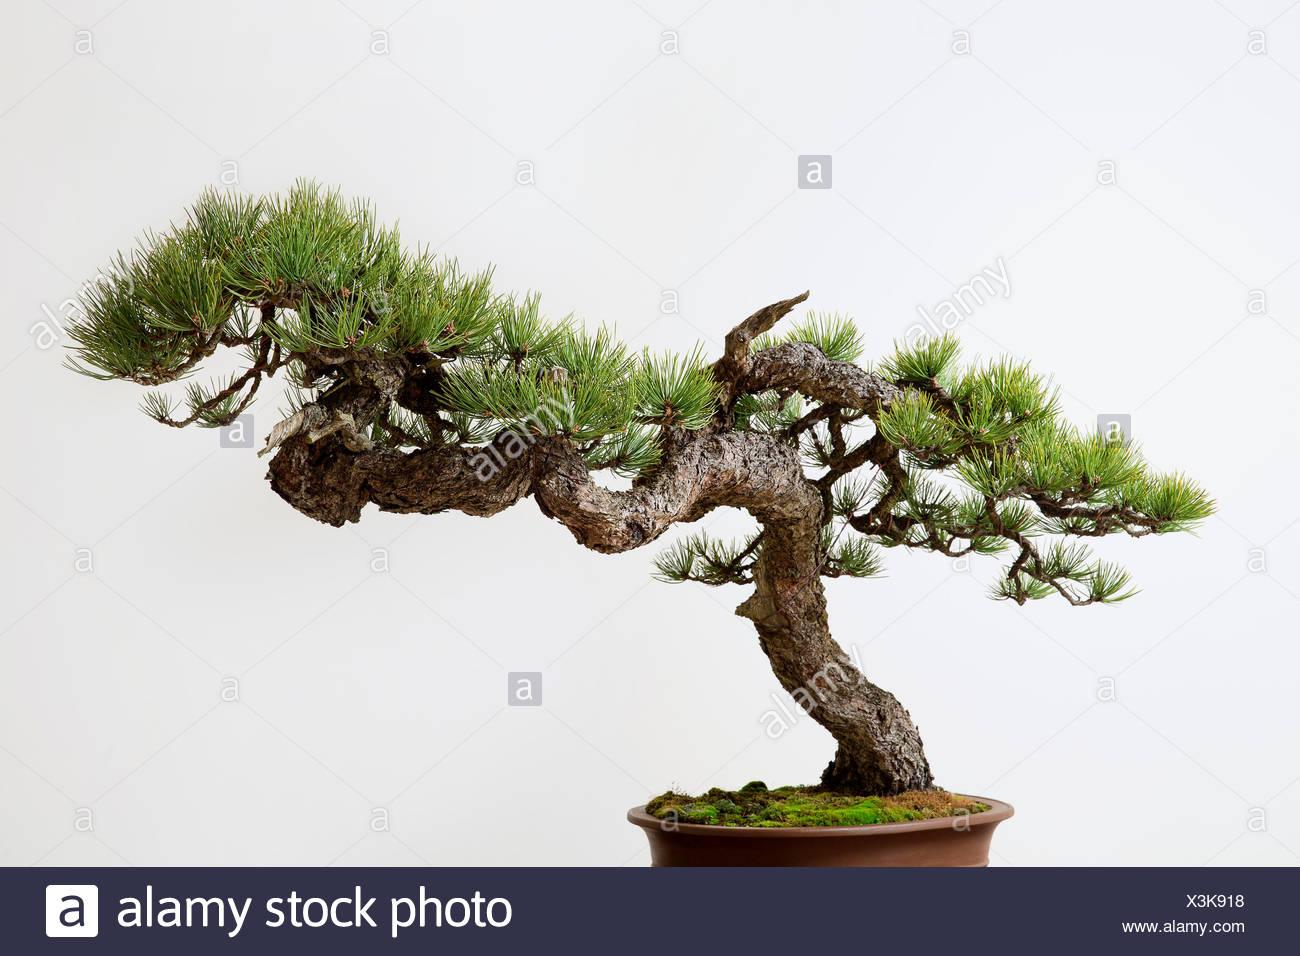 Bonsai Pinus ponderosa (Ponderosa Pine) - Stock Image